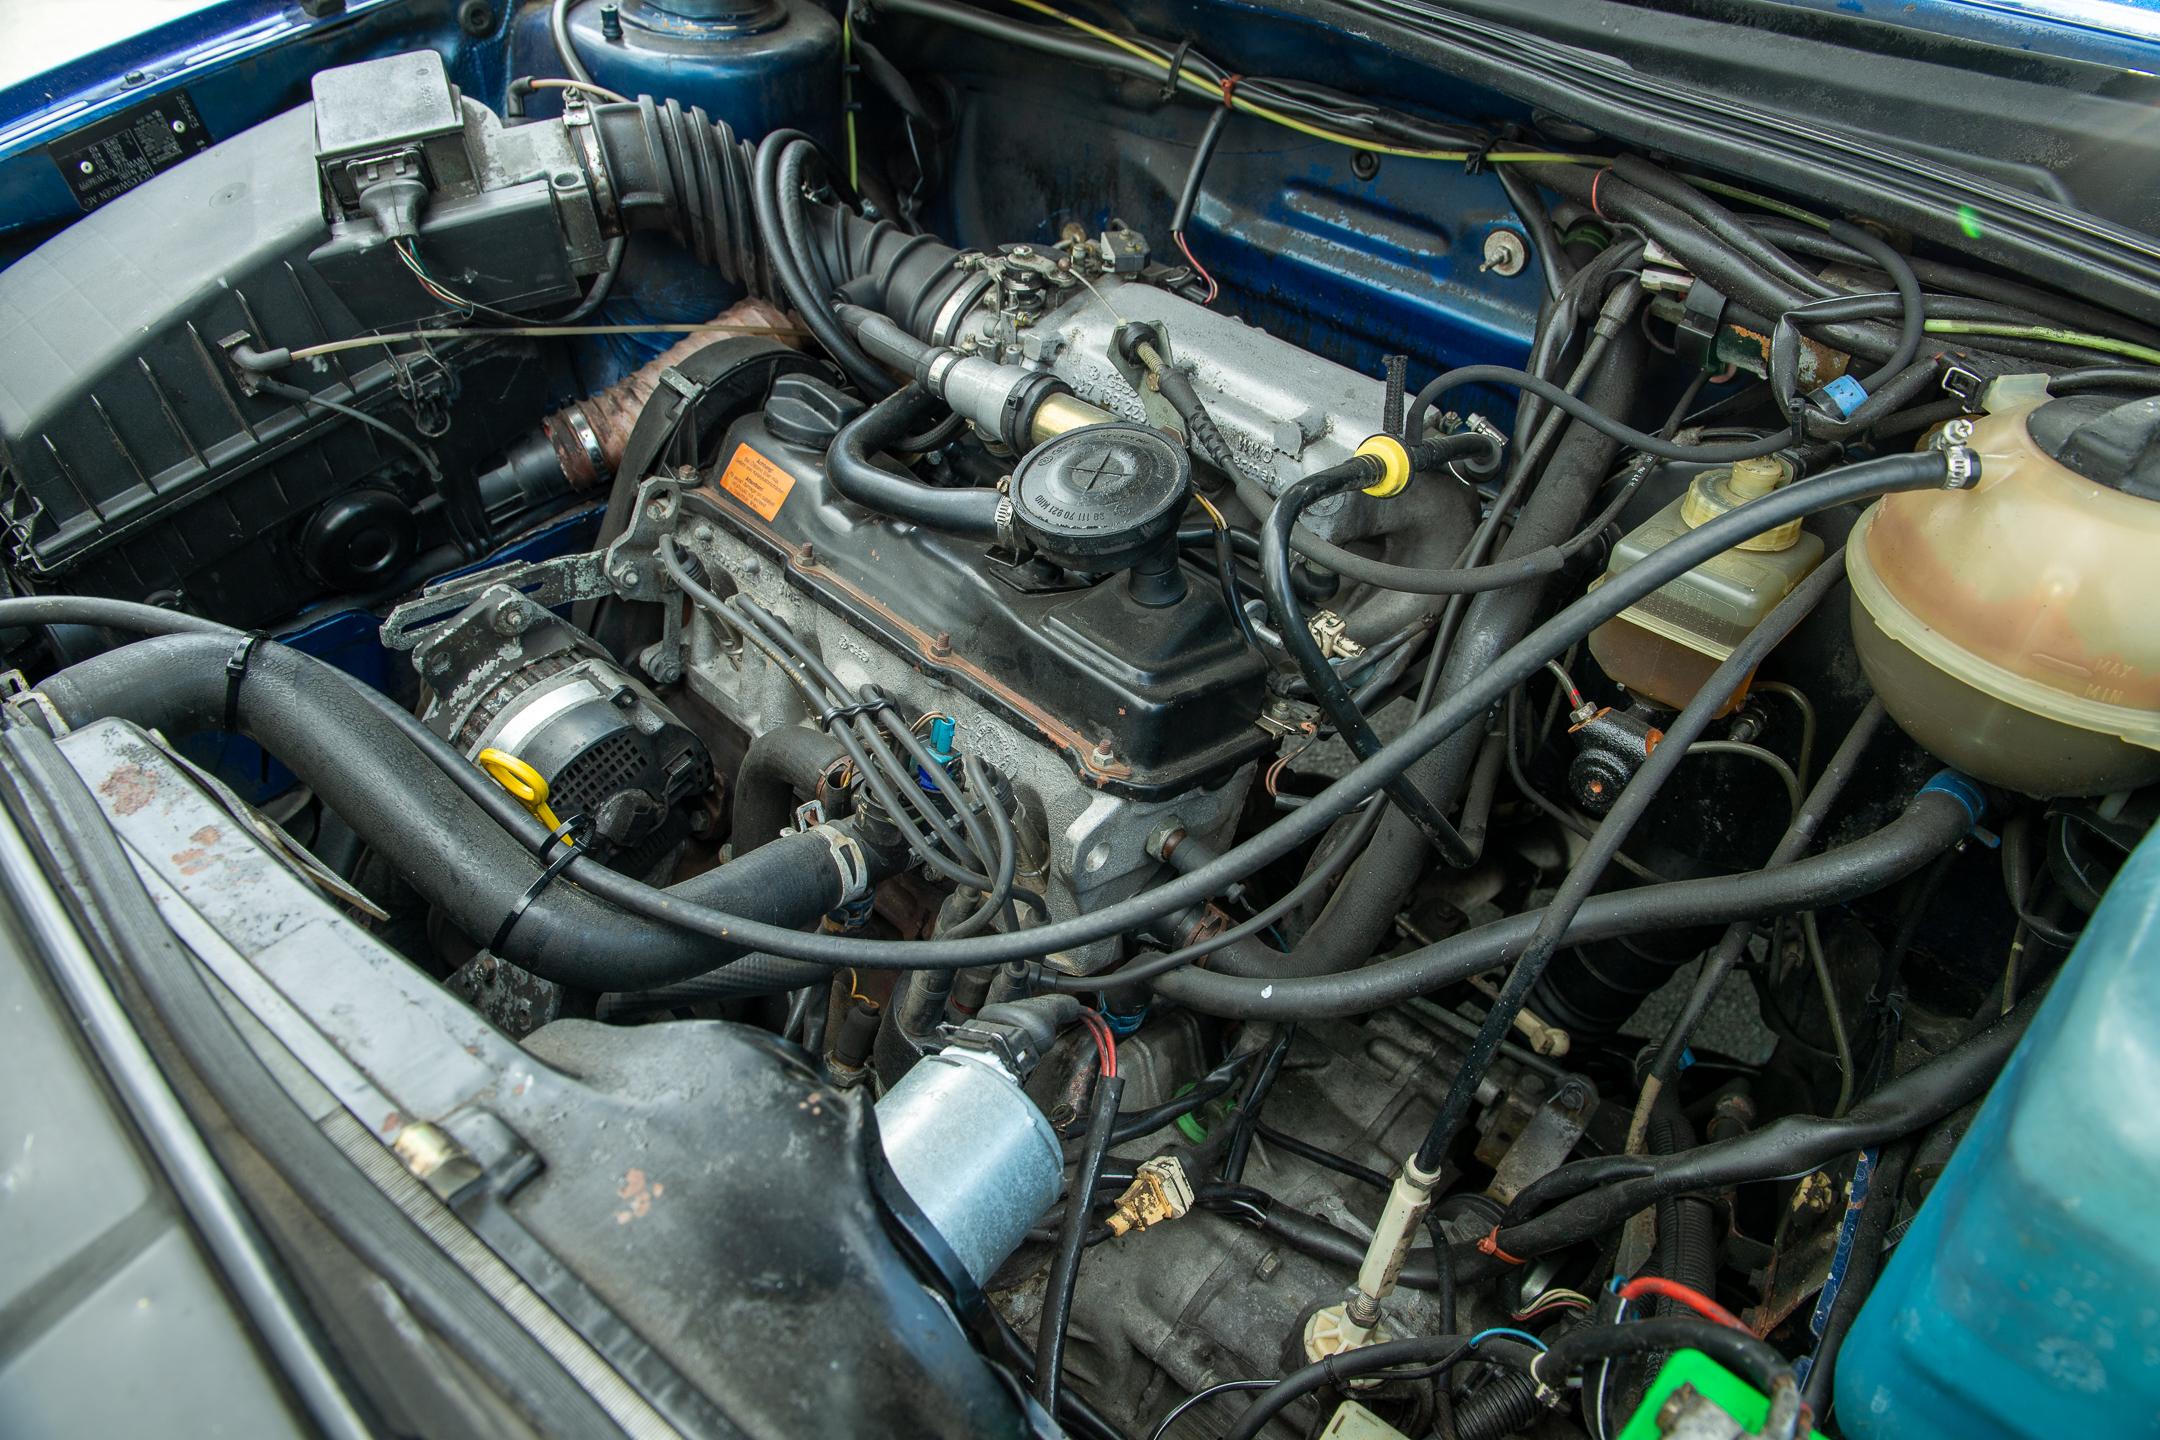 Volkswagen Golf Country engine